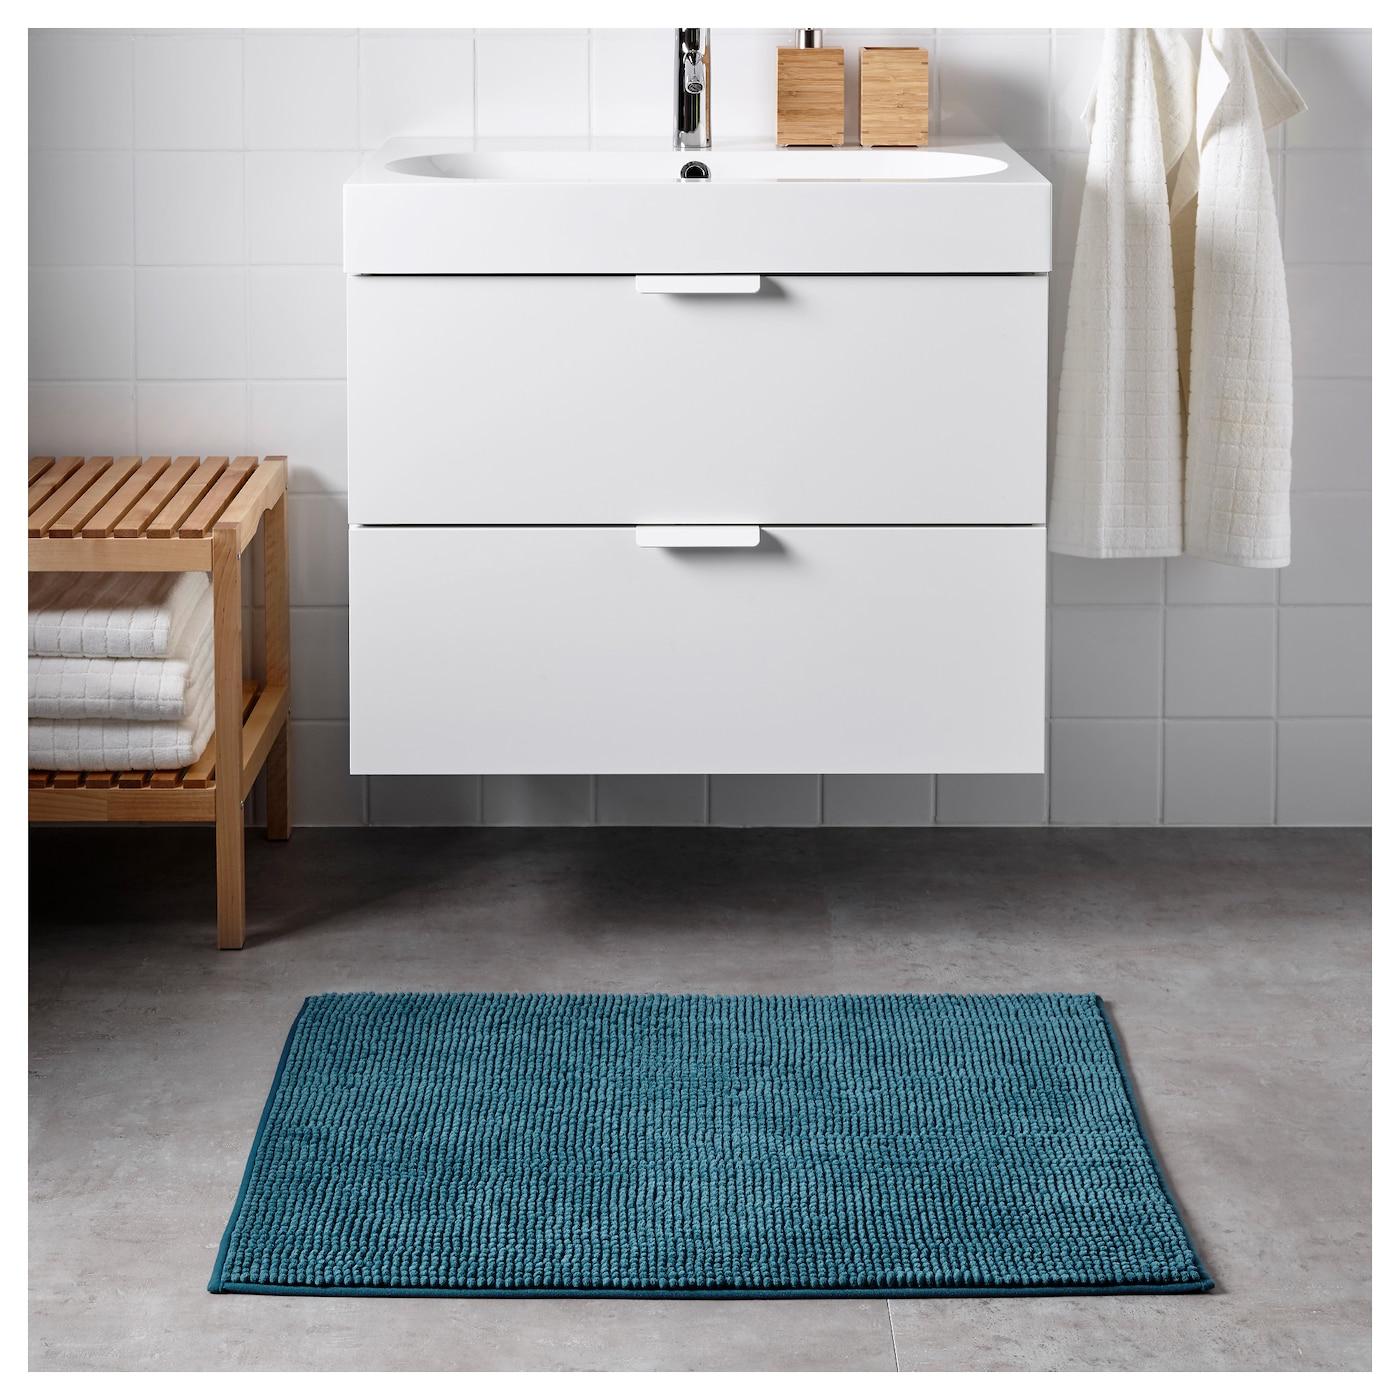 toftbo tapis de bain vert bleu 60x90 cm ikea. Black Bedroom Furniture Sets. Home Design Ideas